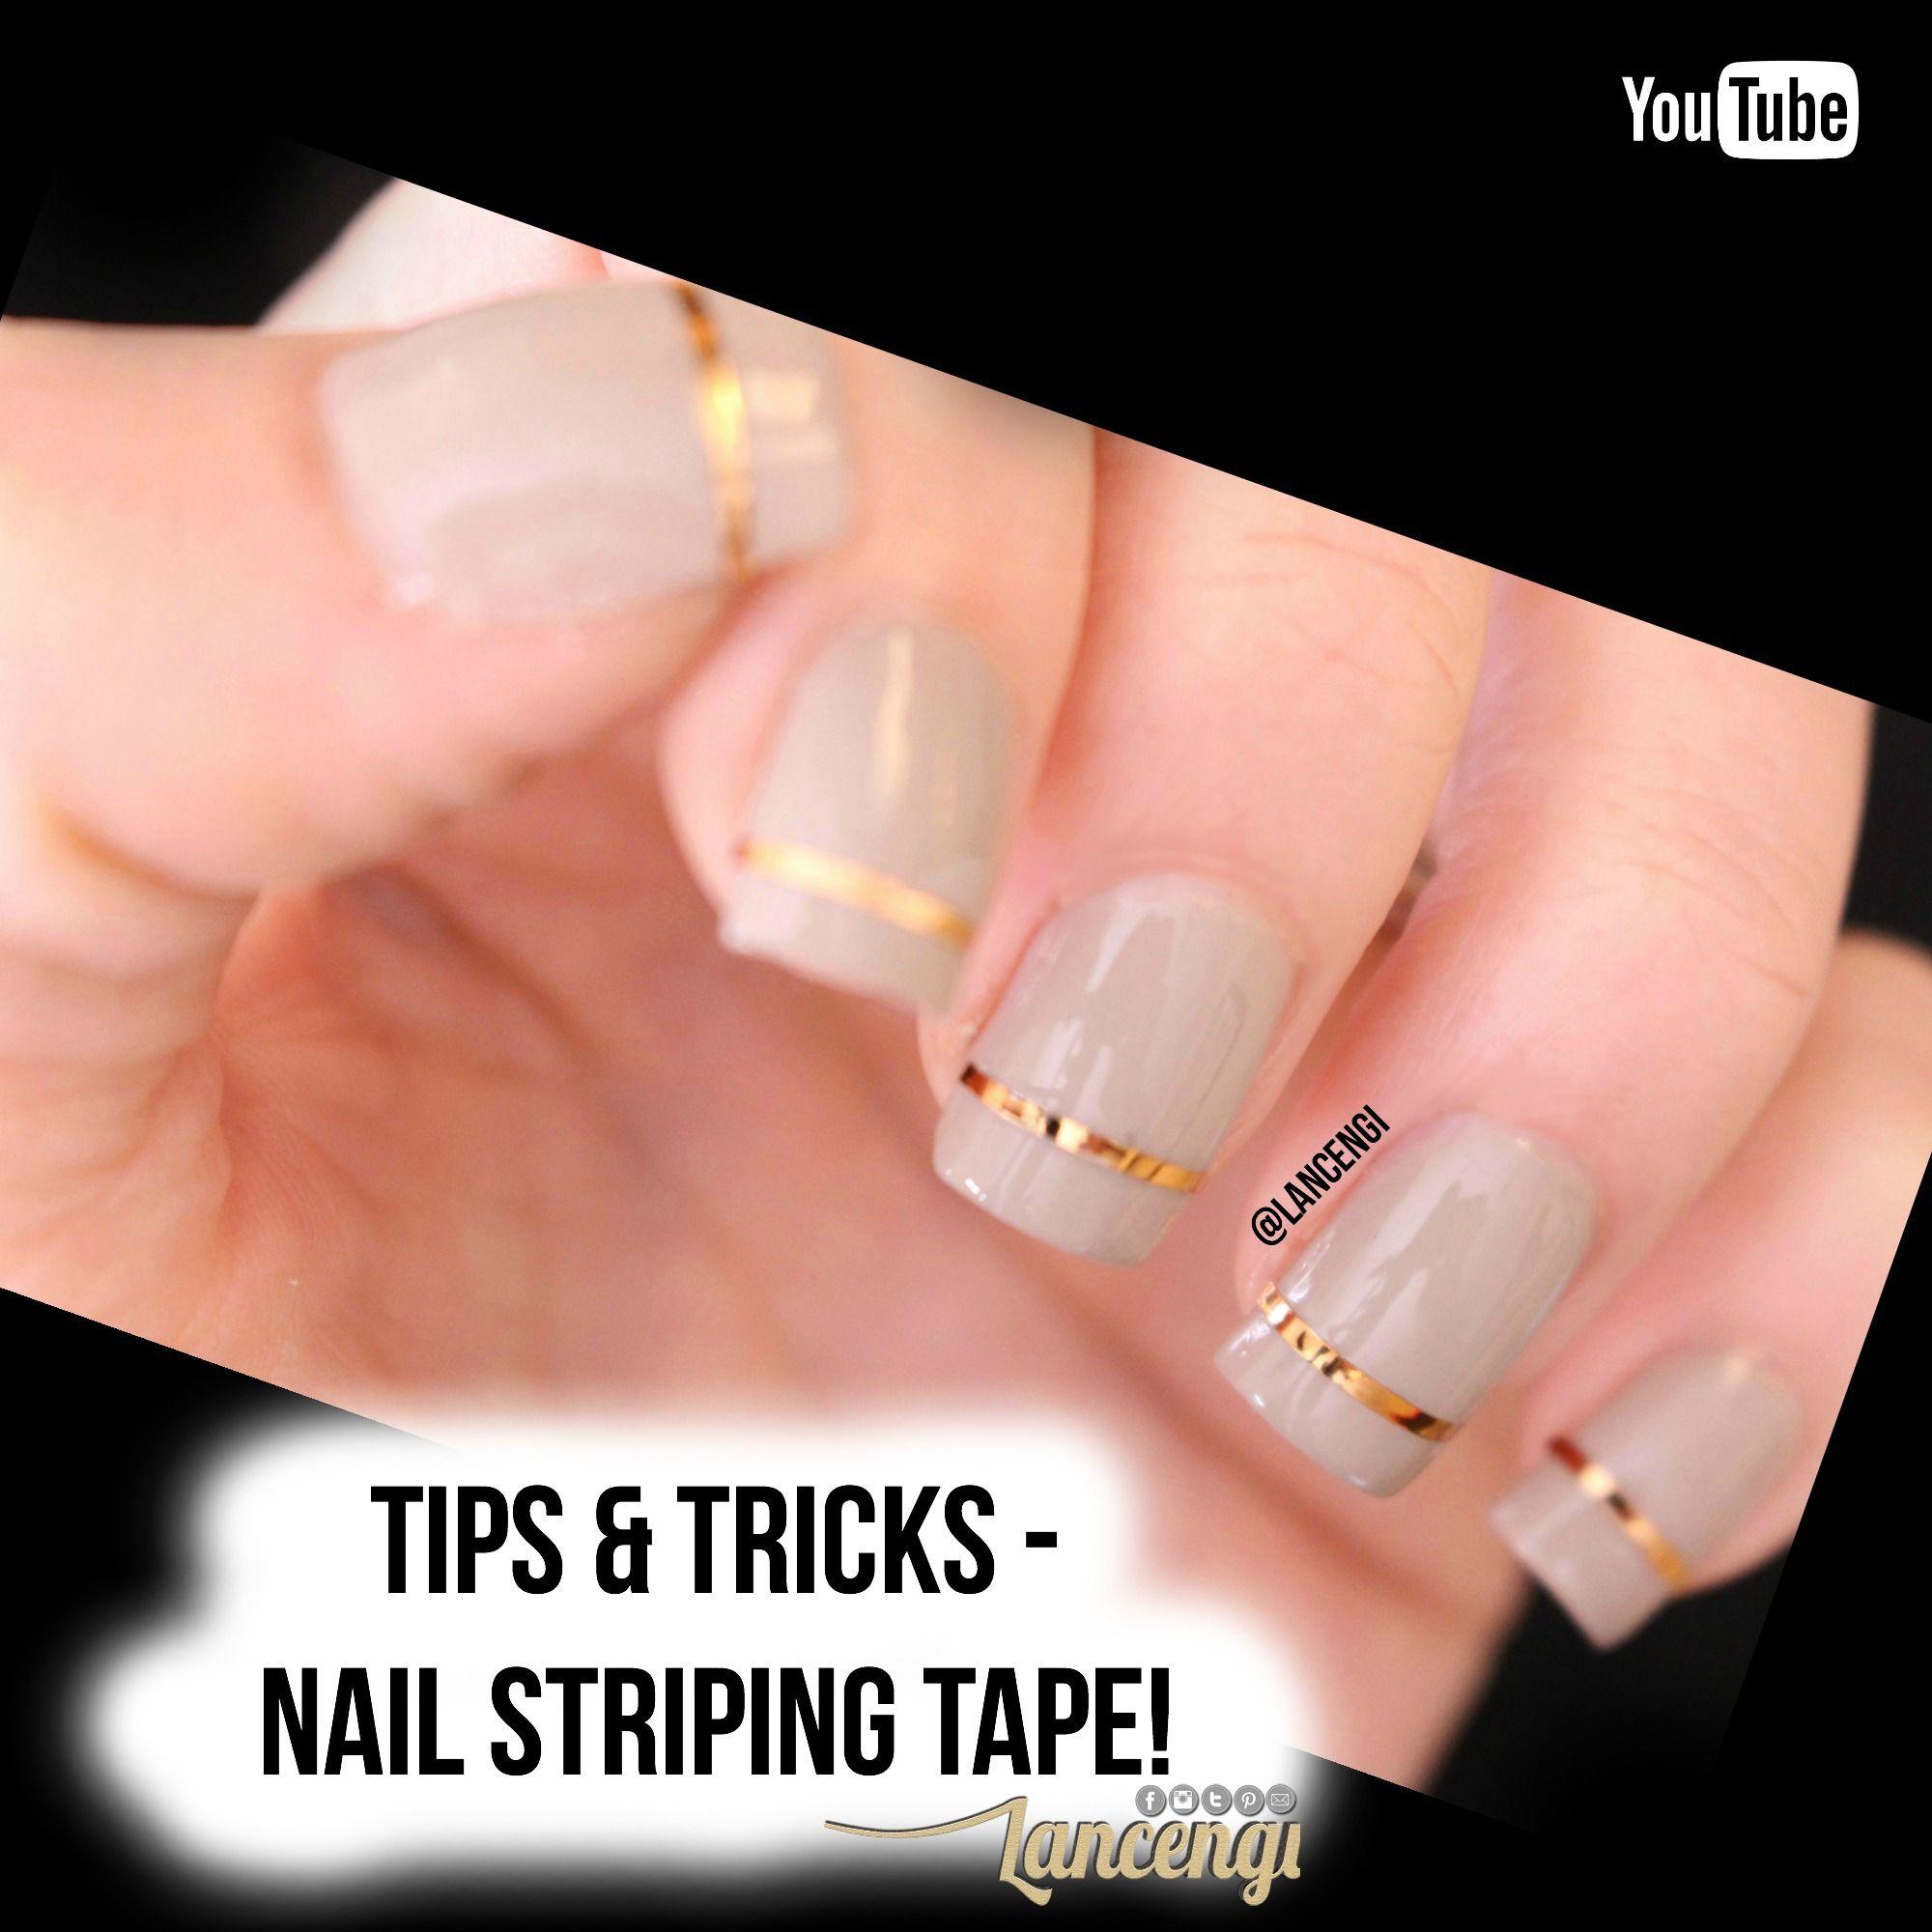 Tan Gold Nail Striping Tape Classic Nail Art Design Tutorial Full Video With Helpful Instructions On You Nail Striping Tape Classic Nail Art Tape Nail Art